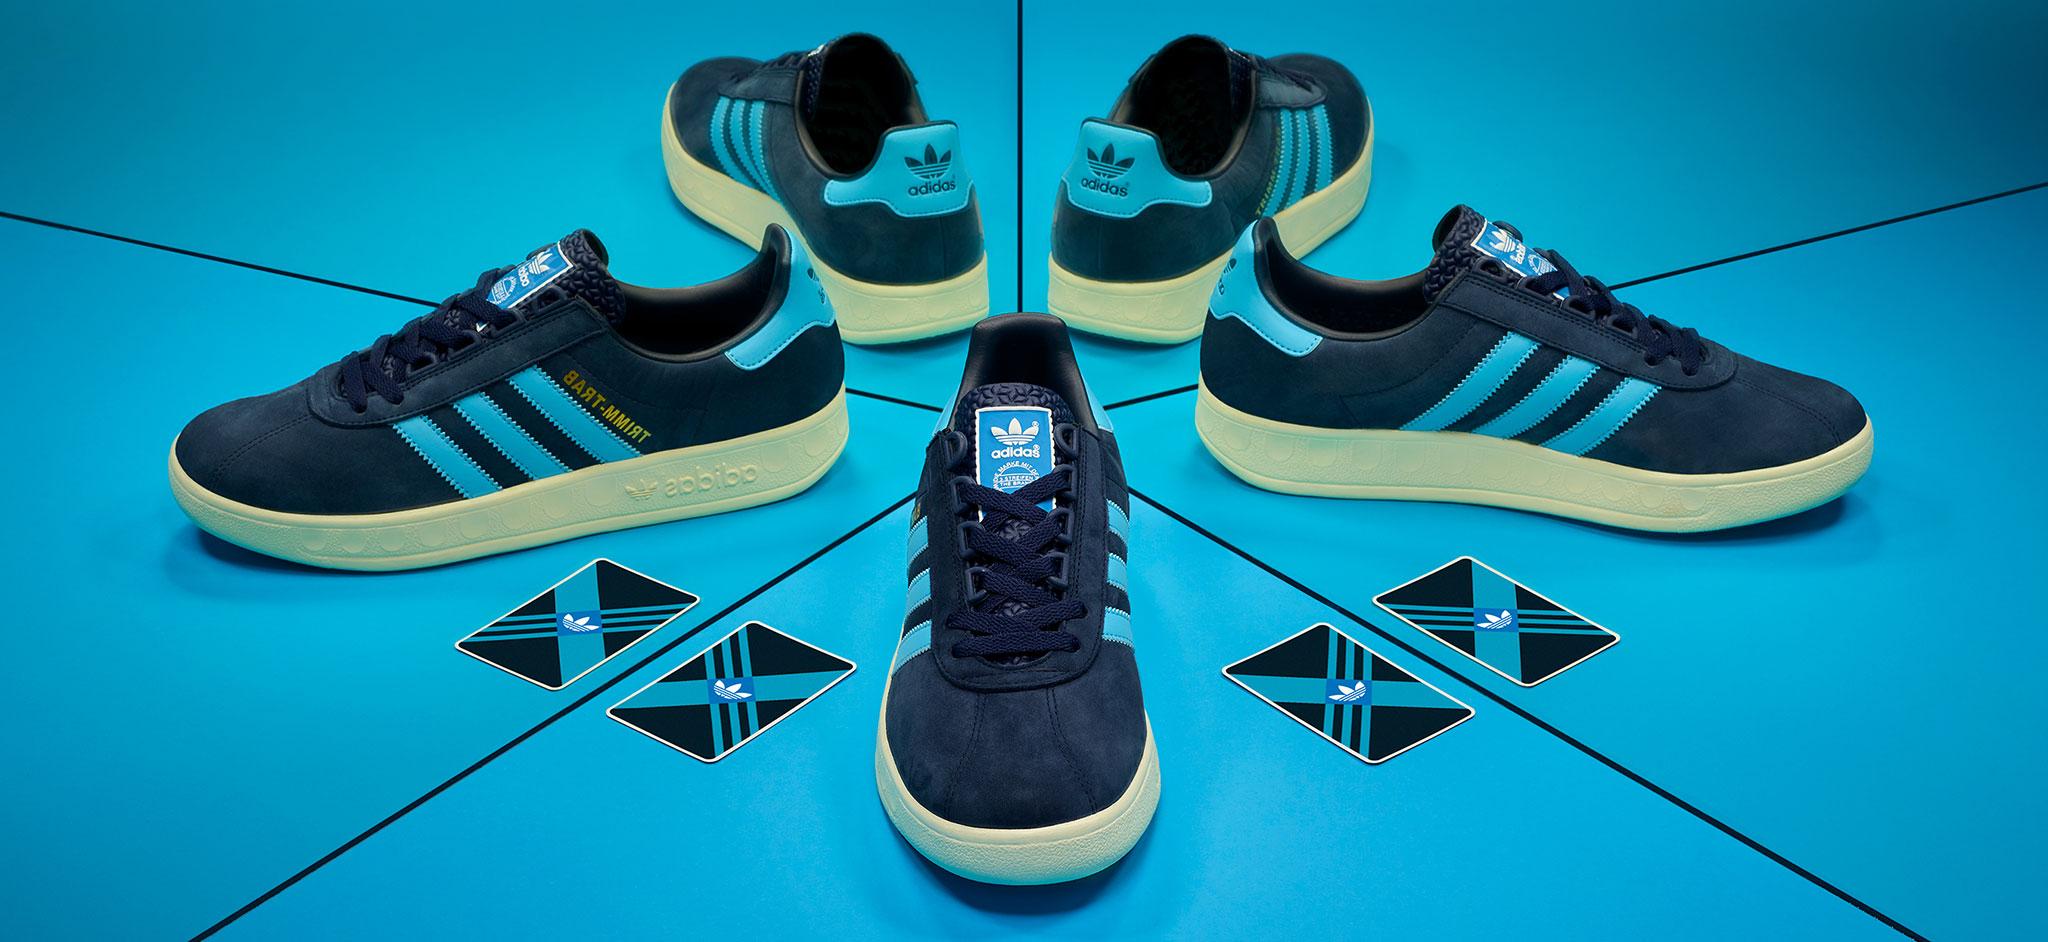 9dd9be9b2 adidas Originals Archive Trimm Trab  Trimmy  - Exclusivité size